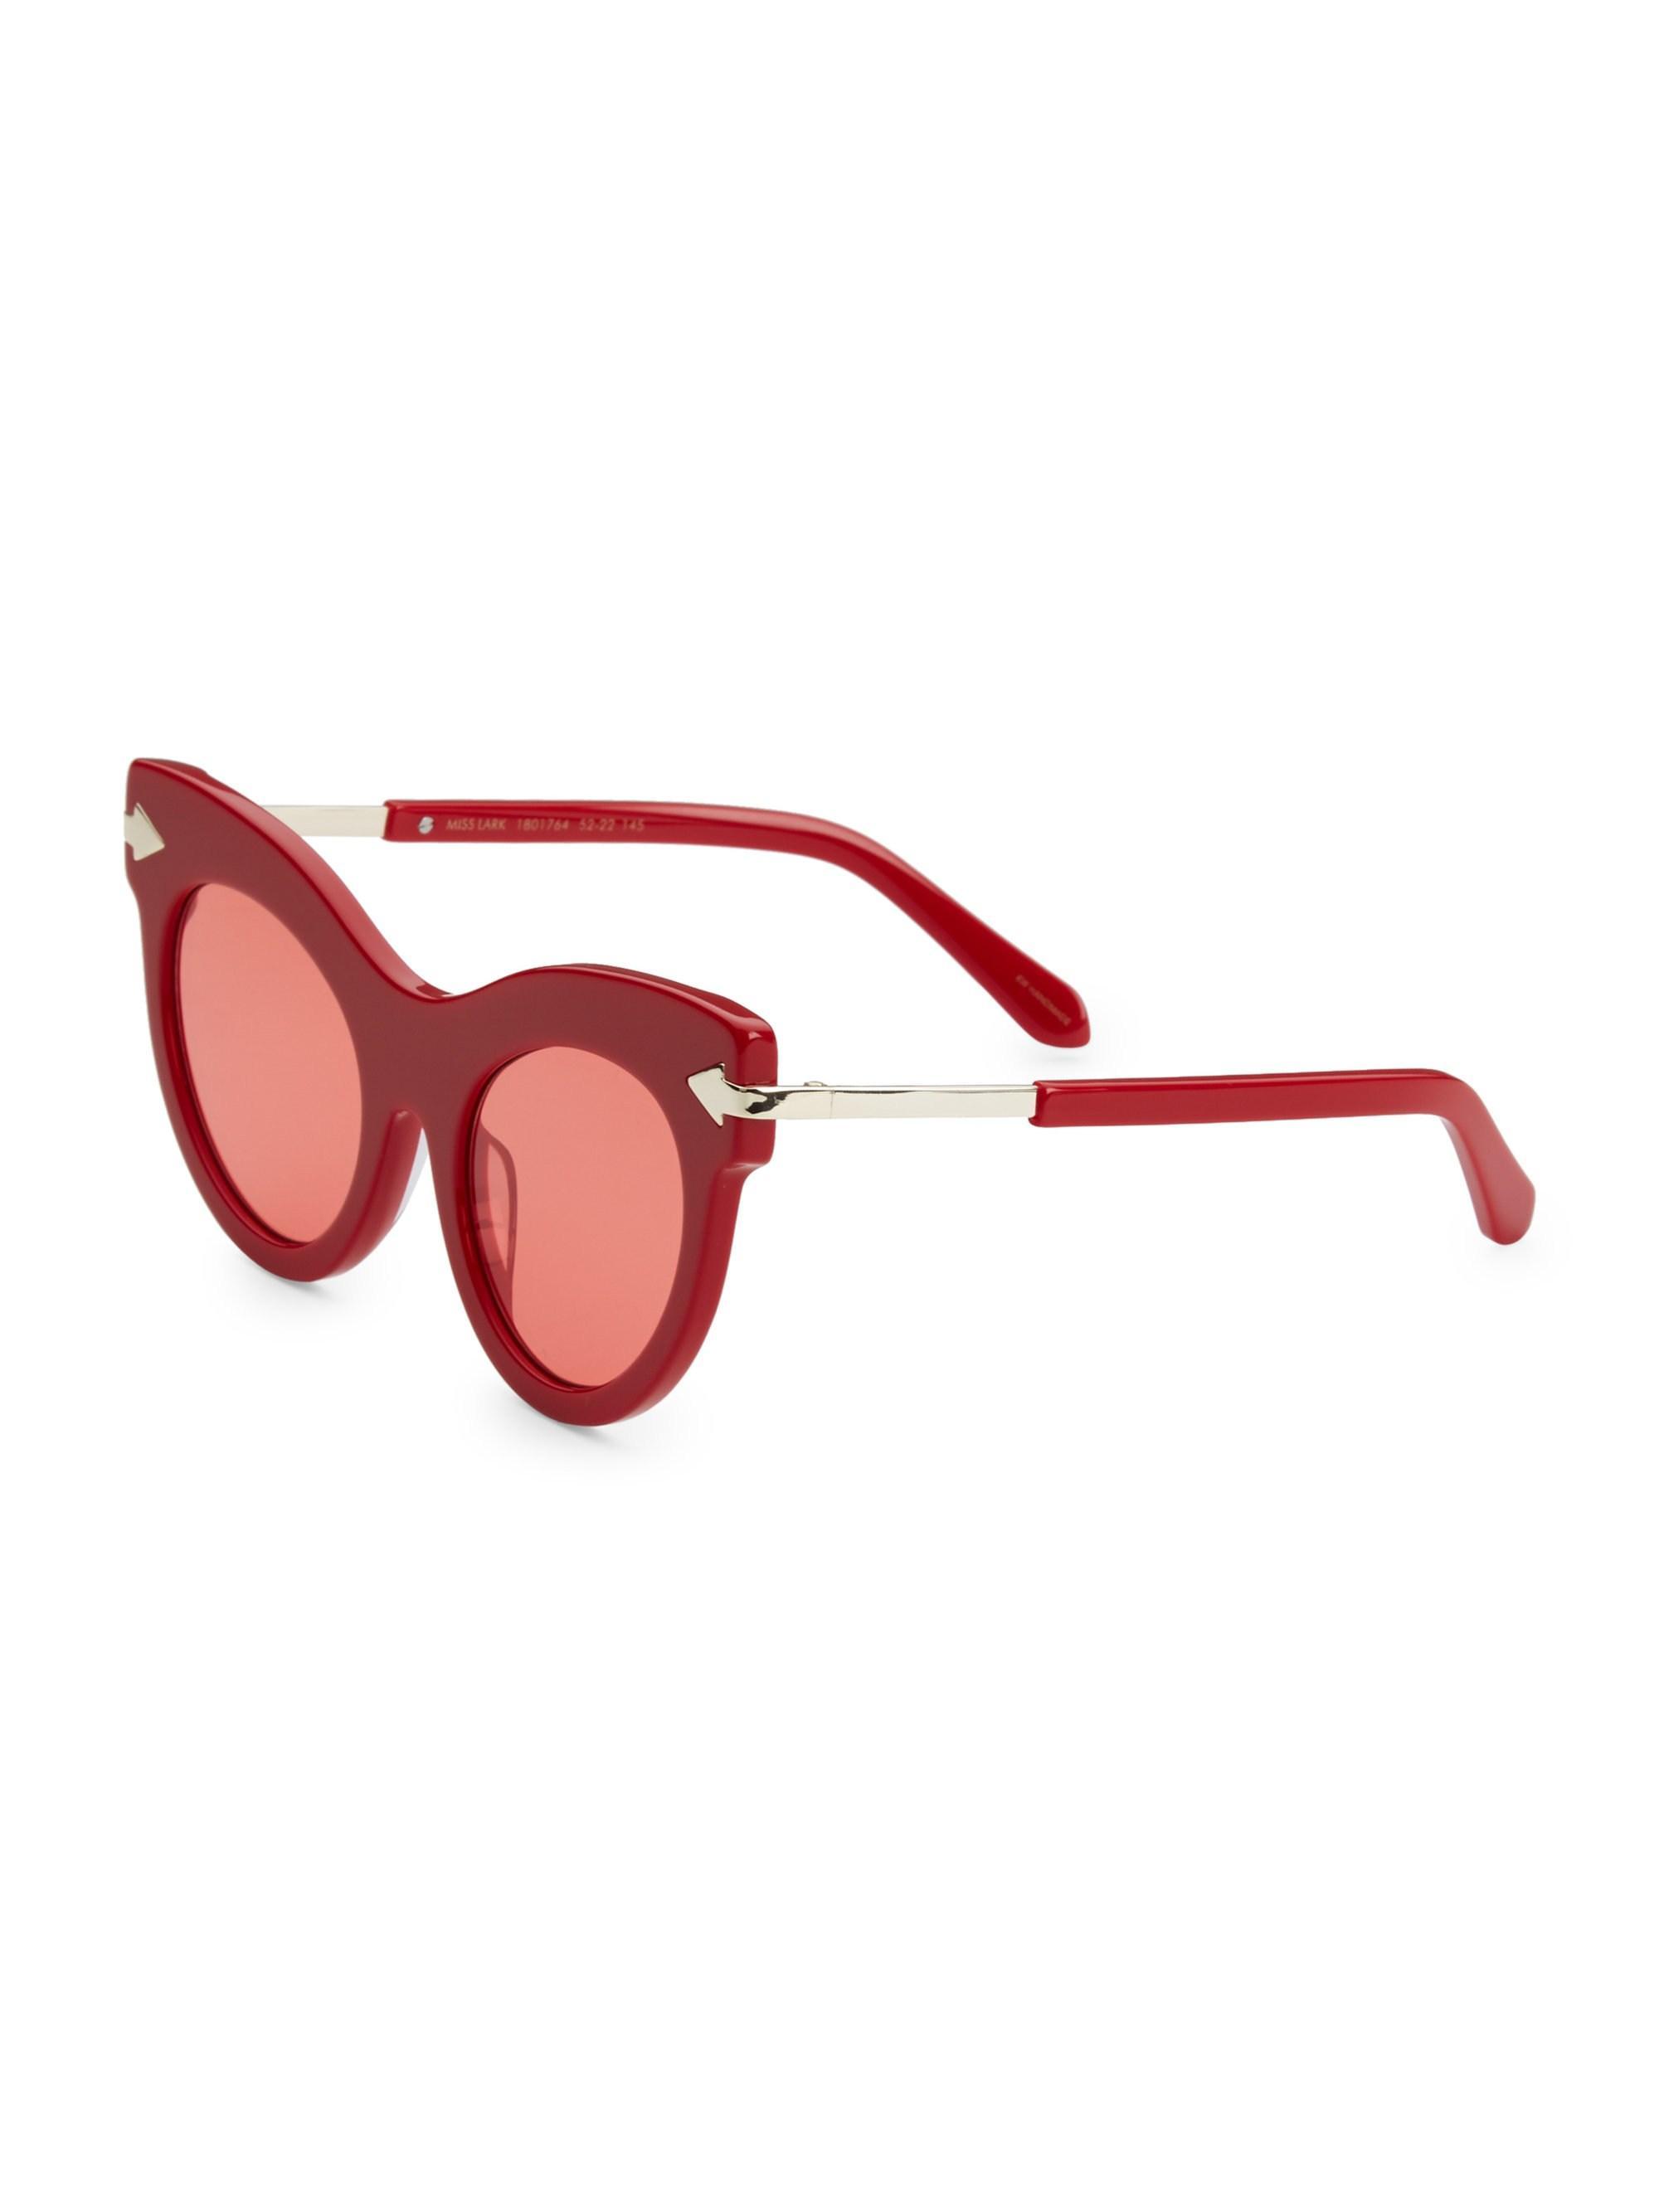 bd544d5fd4 Karen Walker - Women s 52mm Miss Lark Cat-eye Sunglasses - Red - Lyst. View  fullscreen